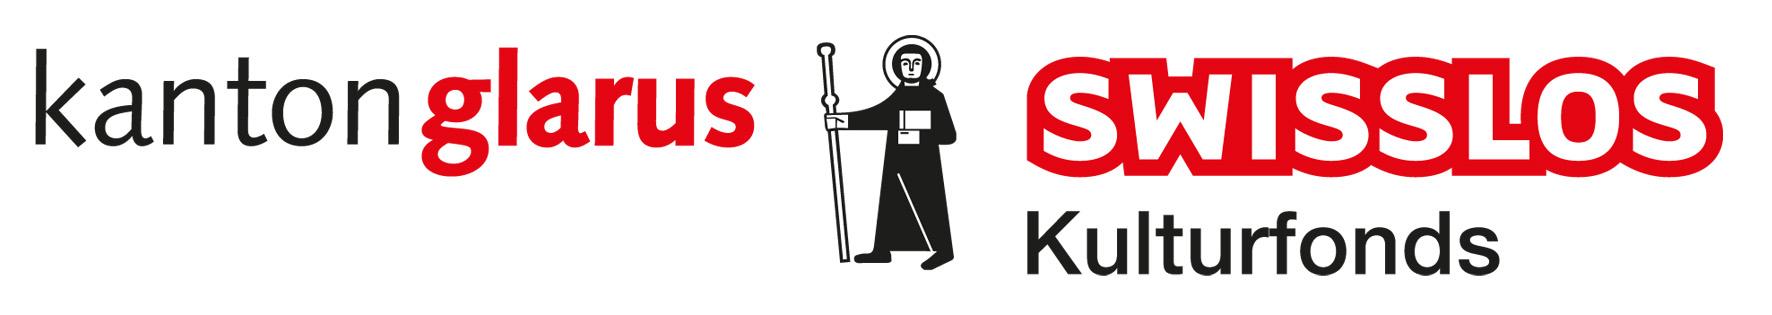 Logo_Kulturfonds_GL_Swisslosjpg